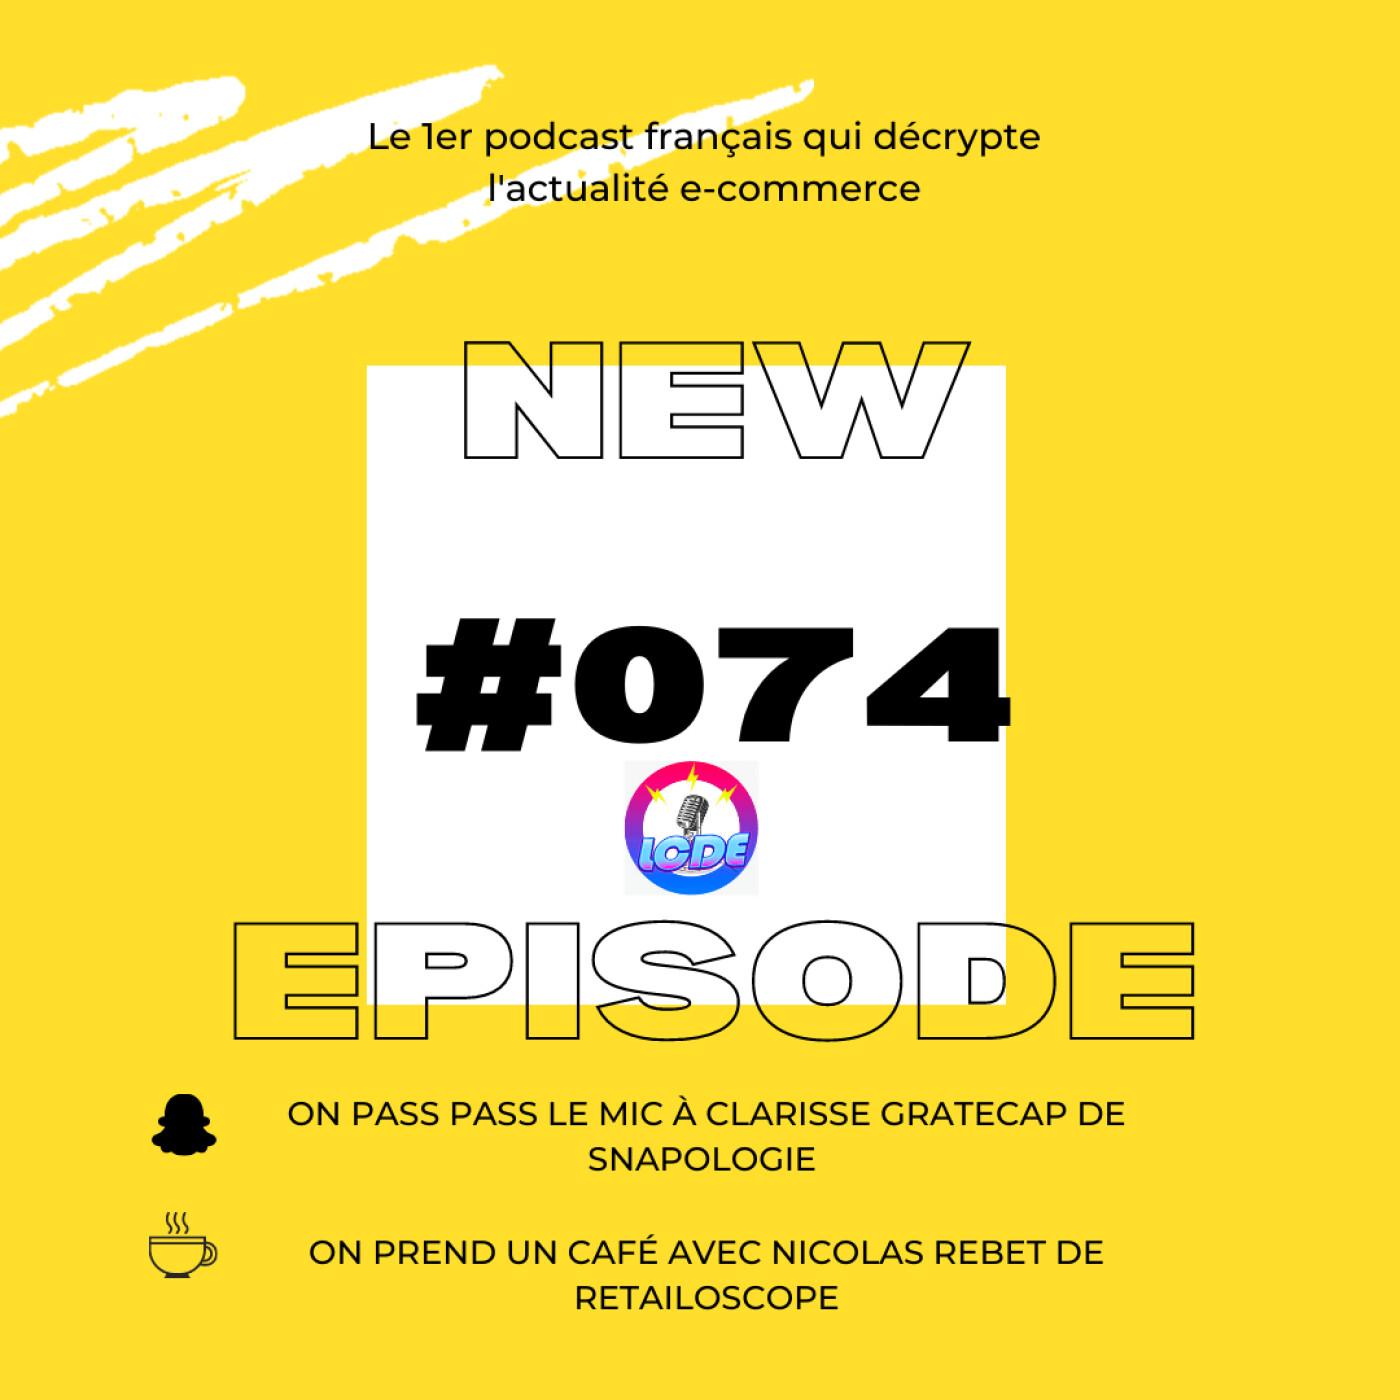 074 - V-Commerce, T-Commerce, Snapologie avec Clarisse Gratecap, Innovation retail avec Nicolas Rebet, ...